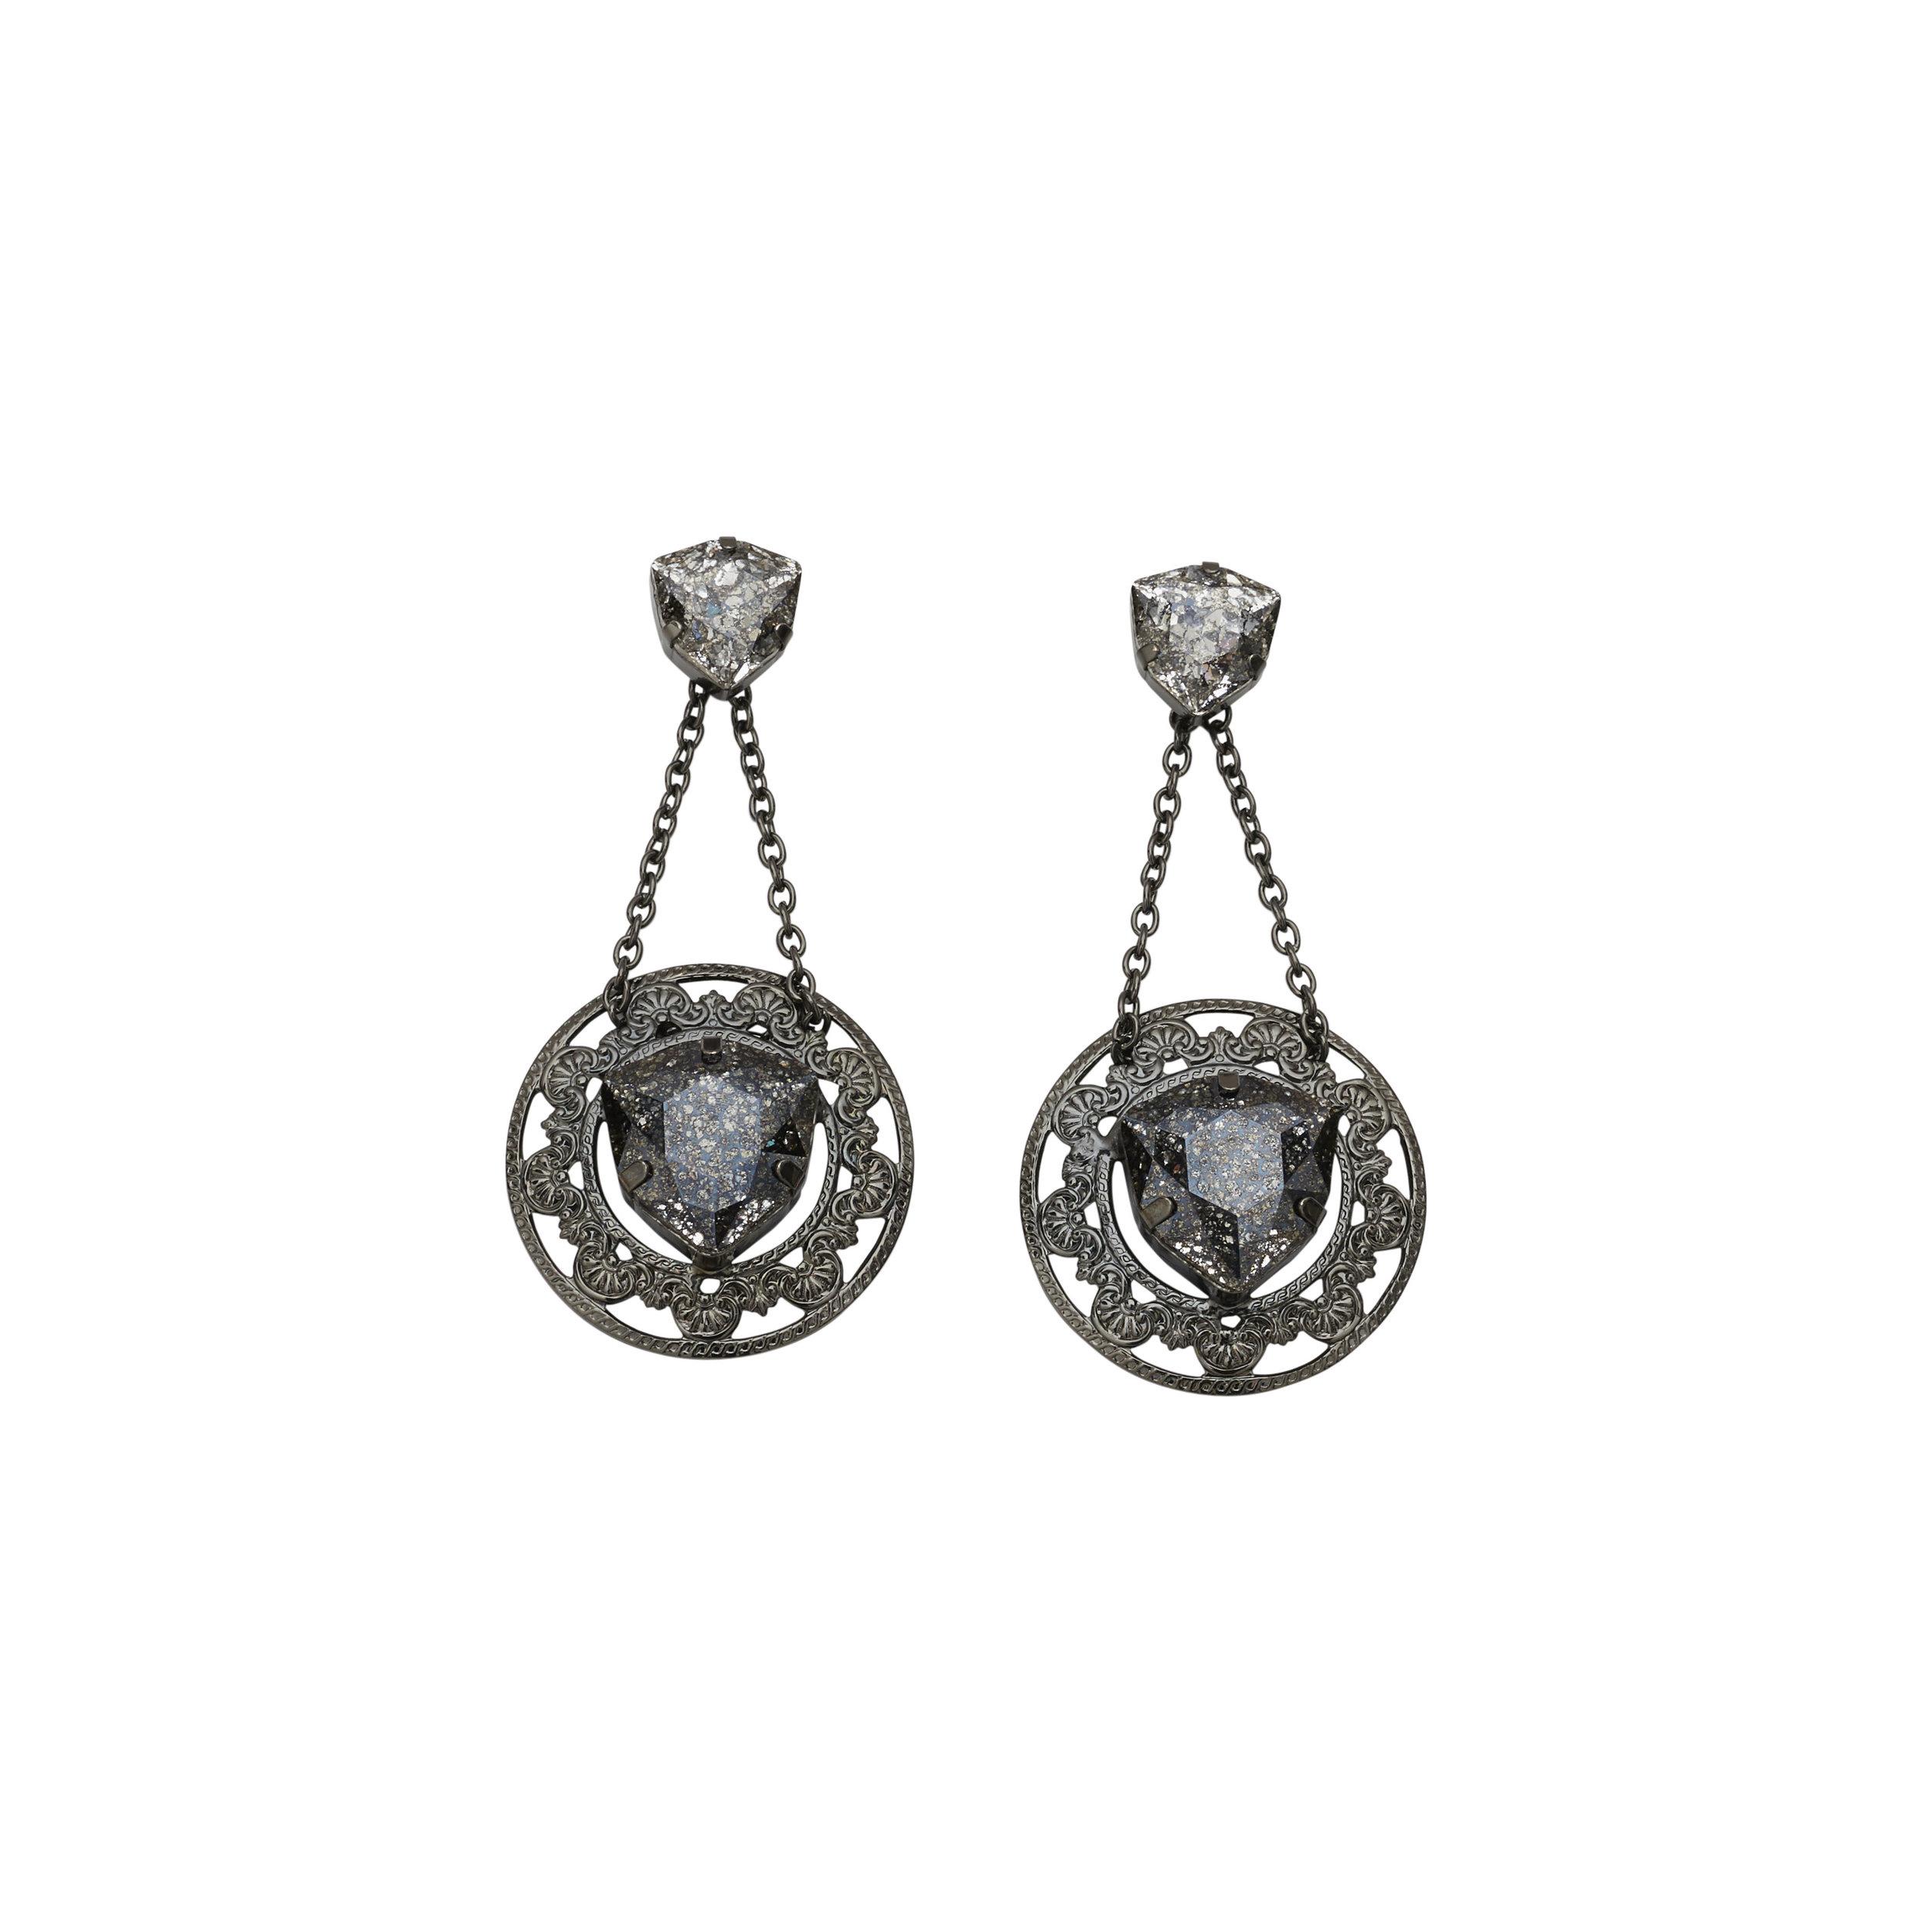 5da8d2ce4 Arcadia Gunmetal Earrings — BALYCK JEWELLERY